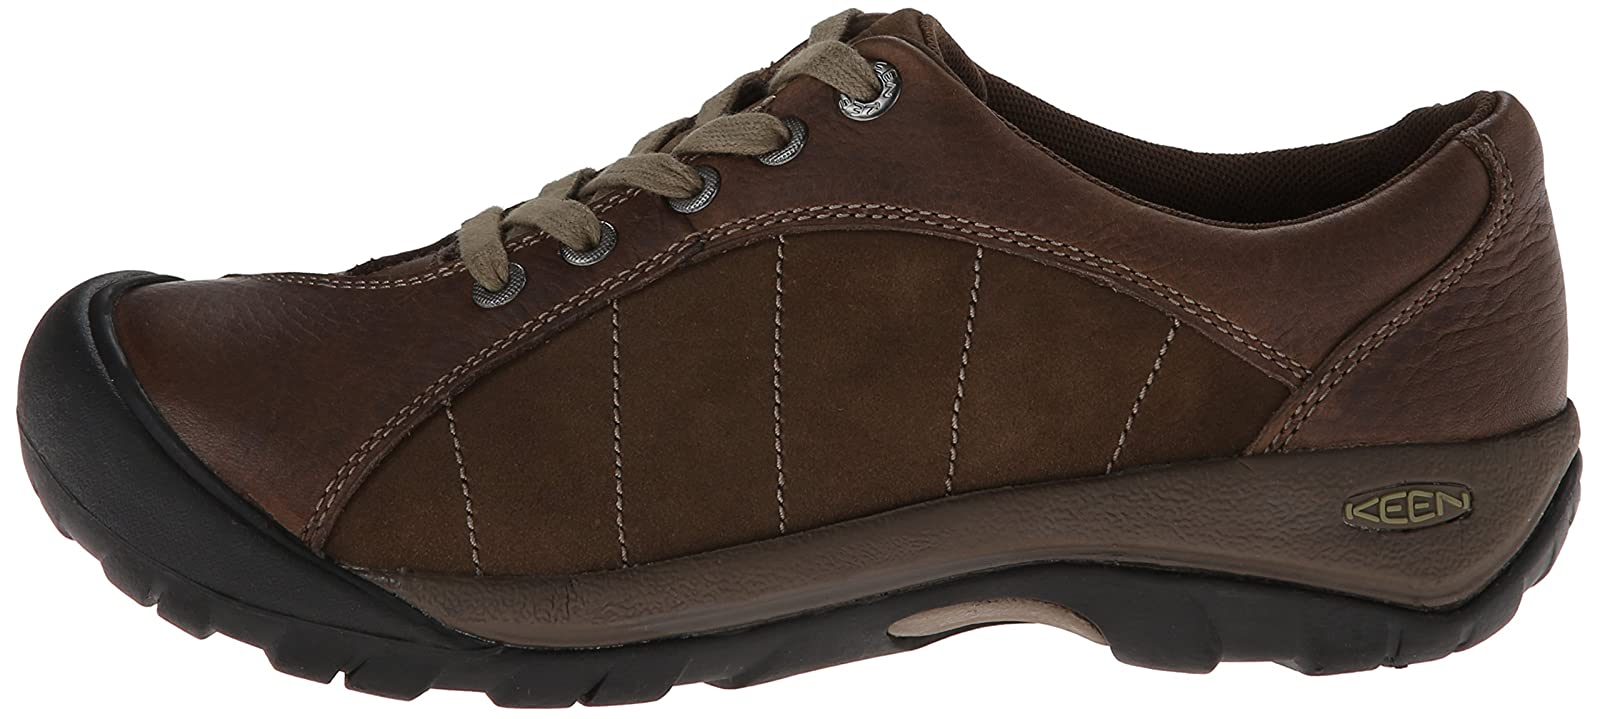 KEEN Women's Presidio Shoe Cascade Brown/Shitake 9.5 M US Women - 5